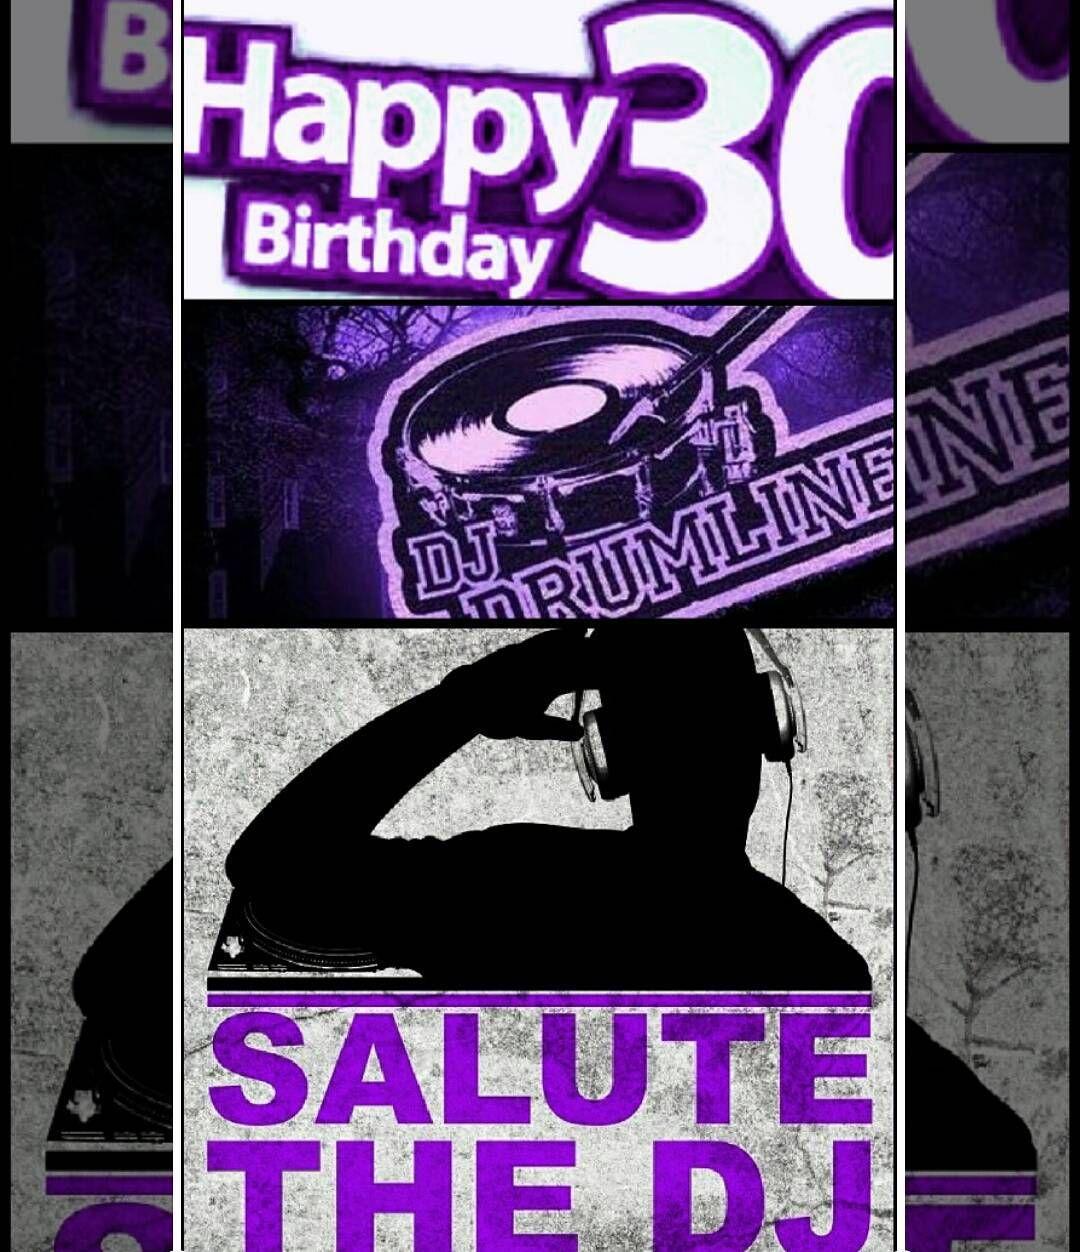 BLESSED TO SEE ANOTHER YEAR! #ThankGod #BirthdayBoy #Dirty30 #ScorpioSeason #SaluteTheDJ    #PurpleTapeDJs #PTR #PTRemix #PurpleStuff #PTRAlumni #StayScrewedUp #Turntablism #SaluteTheDJ #Texas #DJ #Scratching #713LIFE #Cutting #Mixing #Turntables #Vinyl#CD #MP3#RIPDJScrew #Chopped #Screwed #ChoppedAndScrewed #ScrewstonTX #HTown #Houston #HOUnity by thedrummajorptr http://ift.tt/1HNGVsC